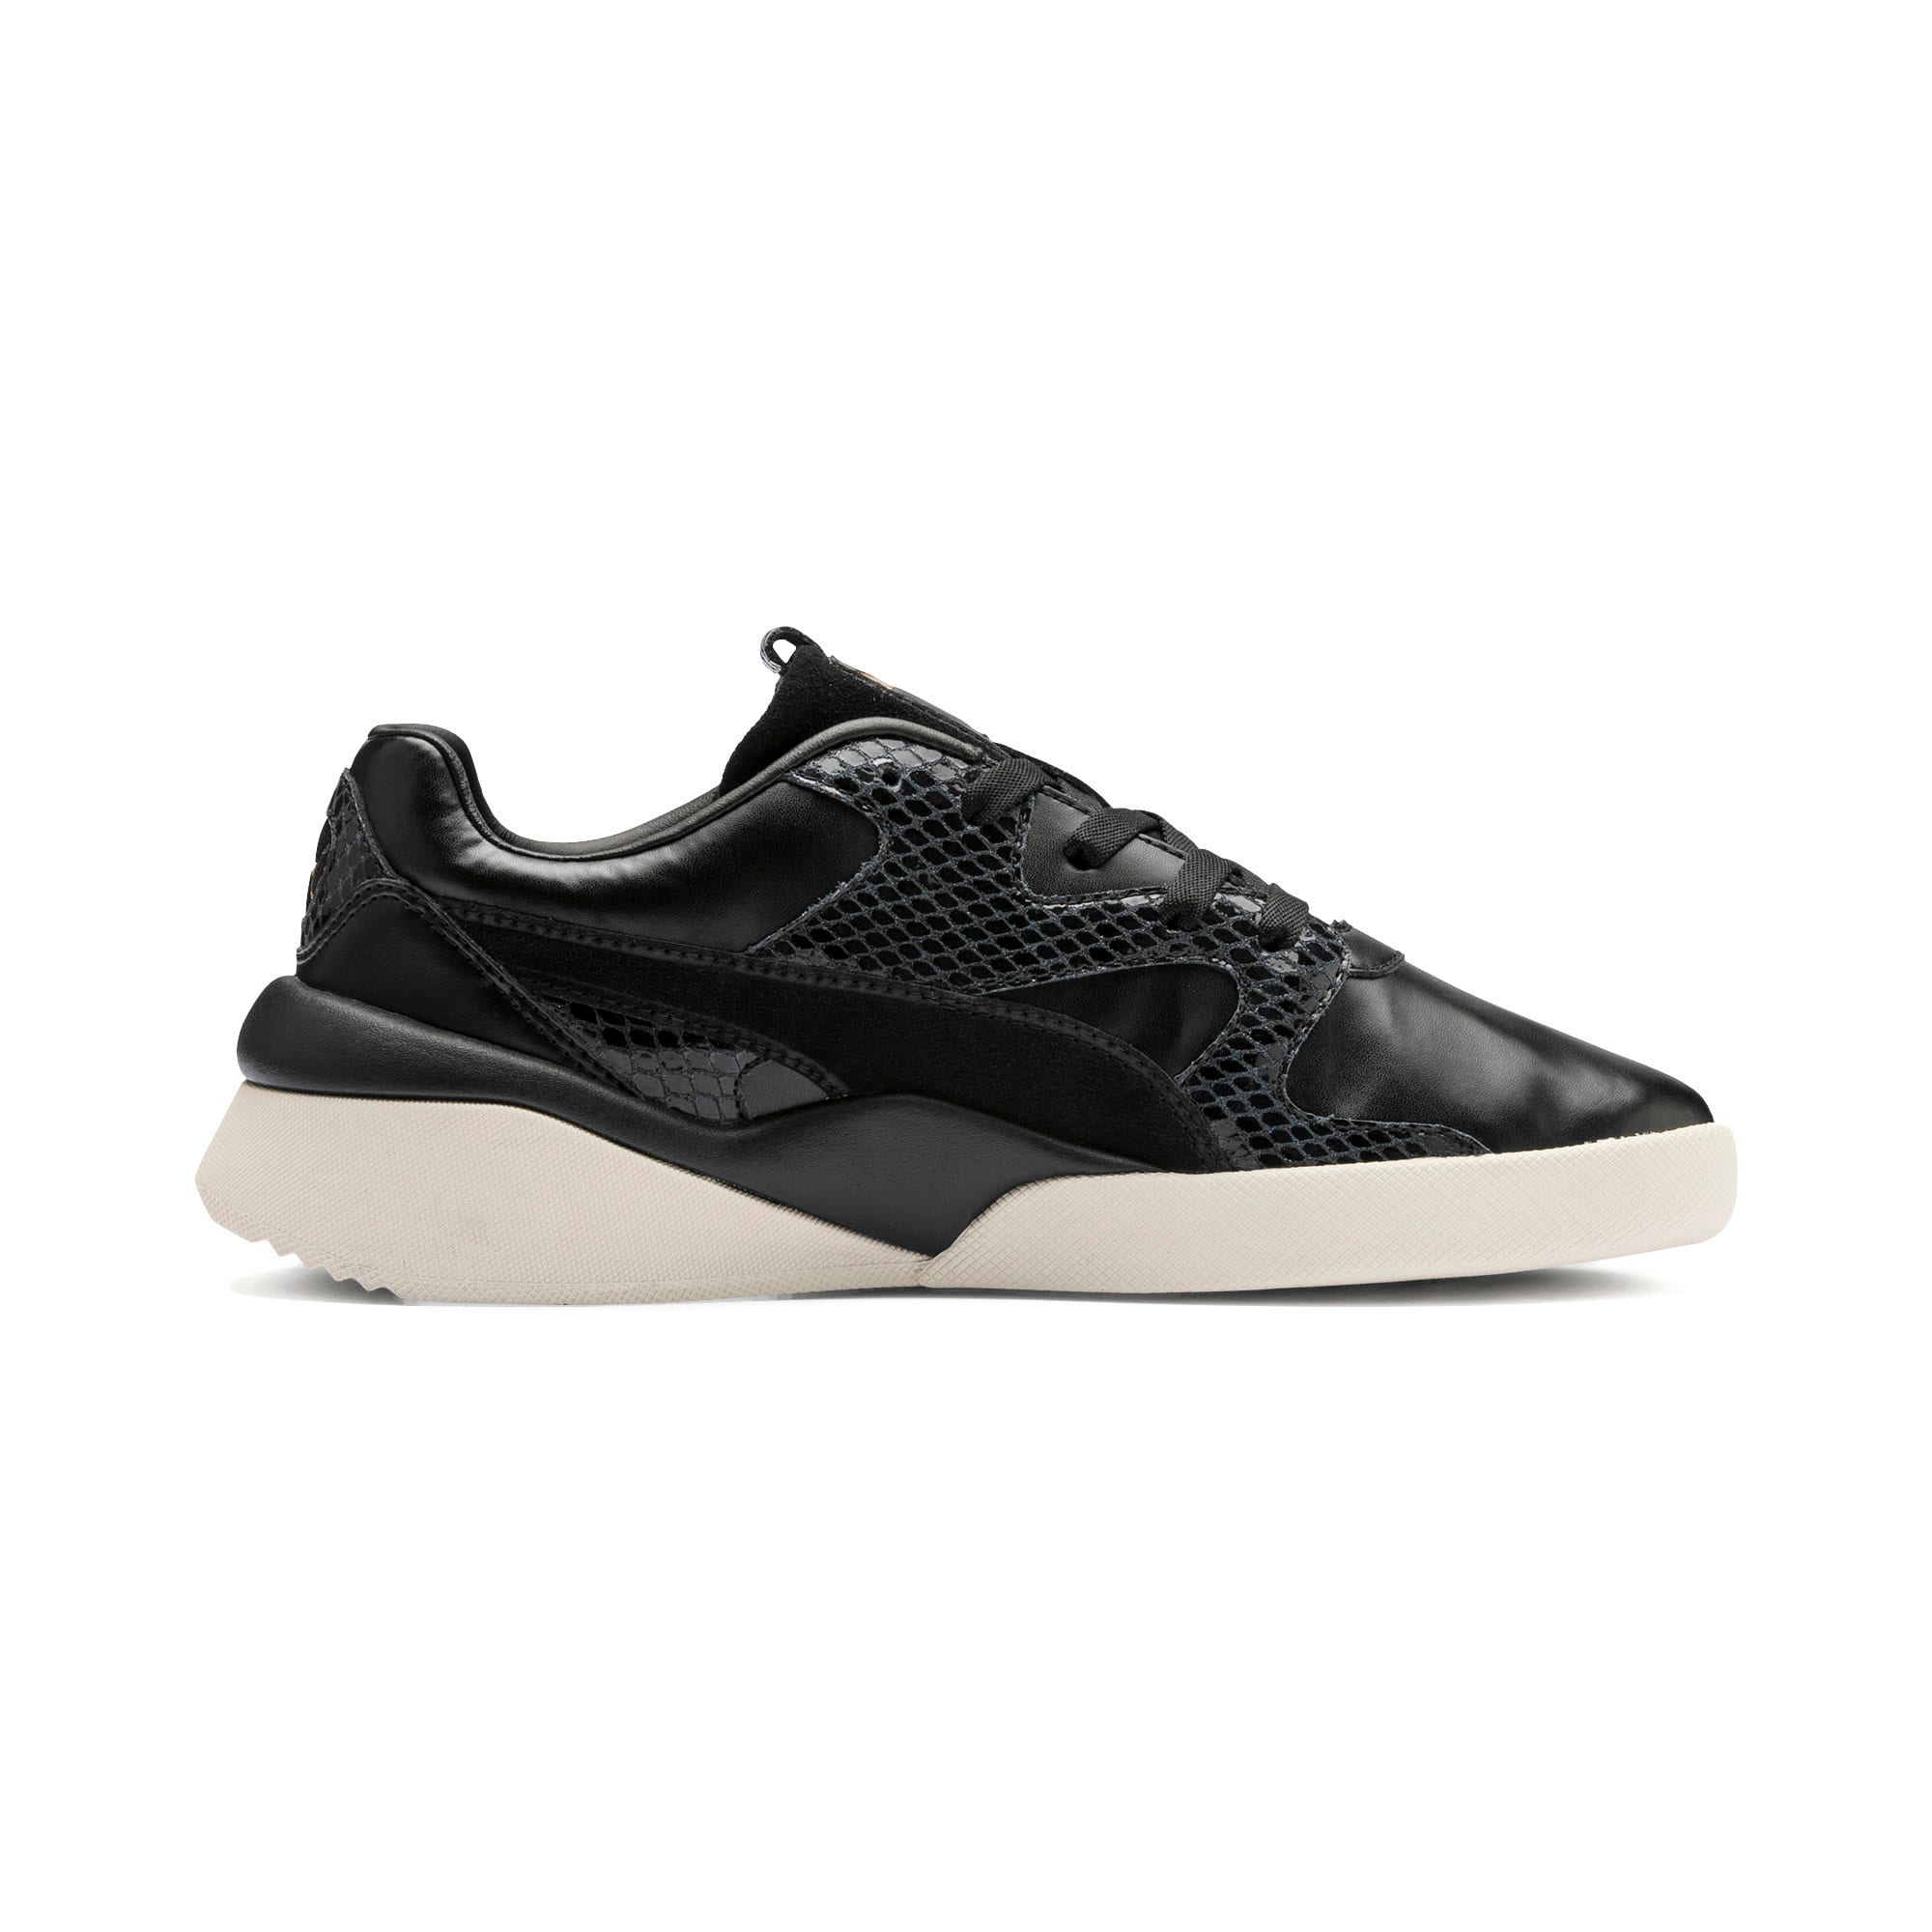 Thumbnail 6 of Aeon Play Women's Sneakers, Puma Black, medium